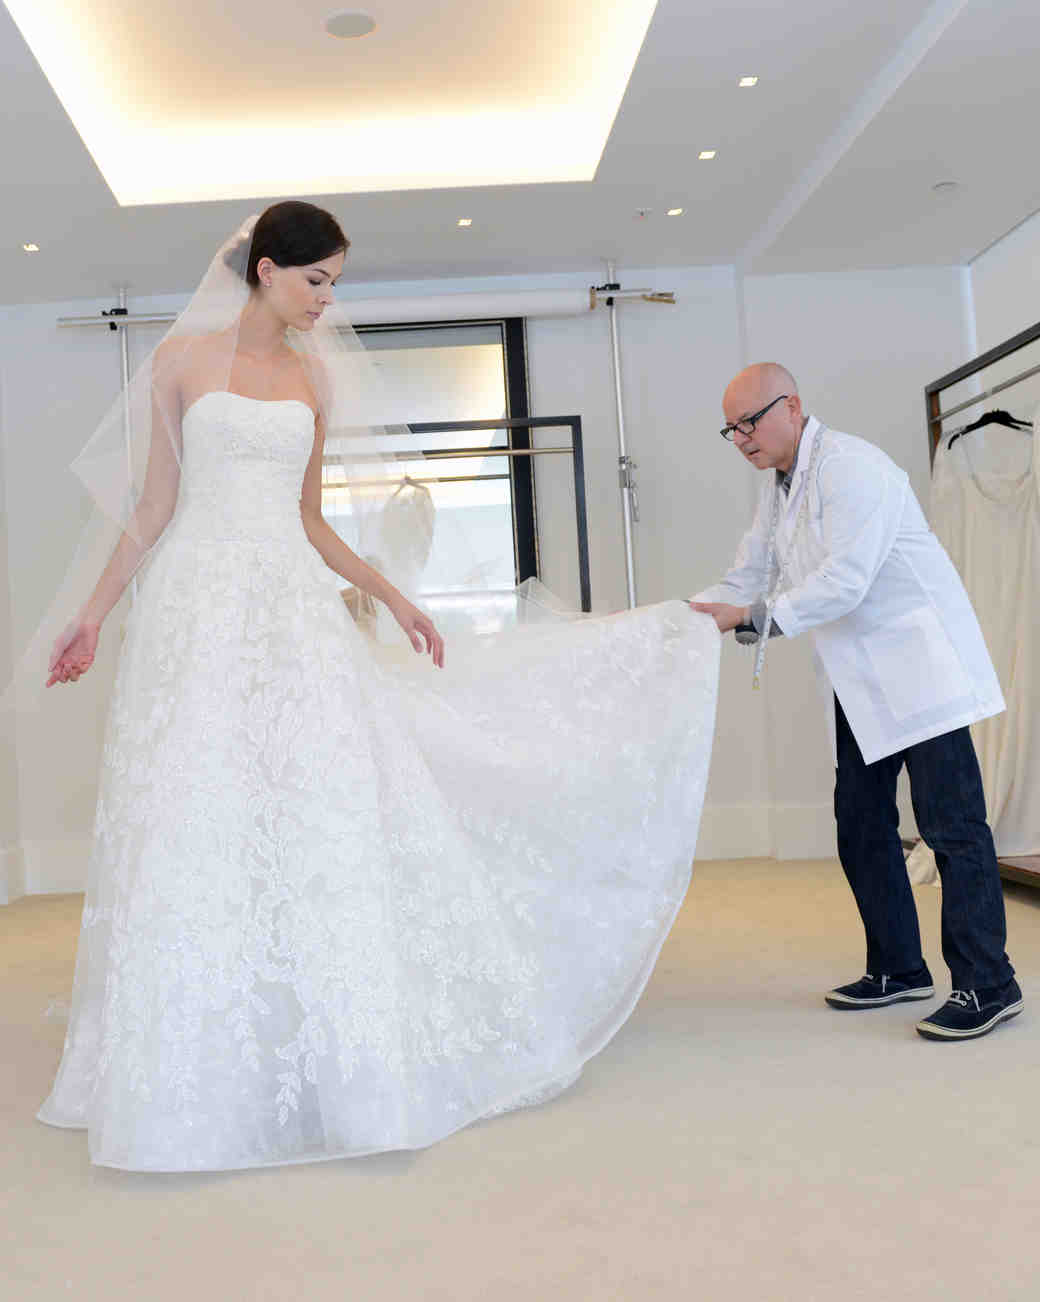 herrera-atelier-making-a-dress-final-fitting-crawford-0814.jpg